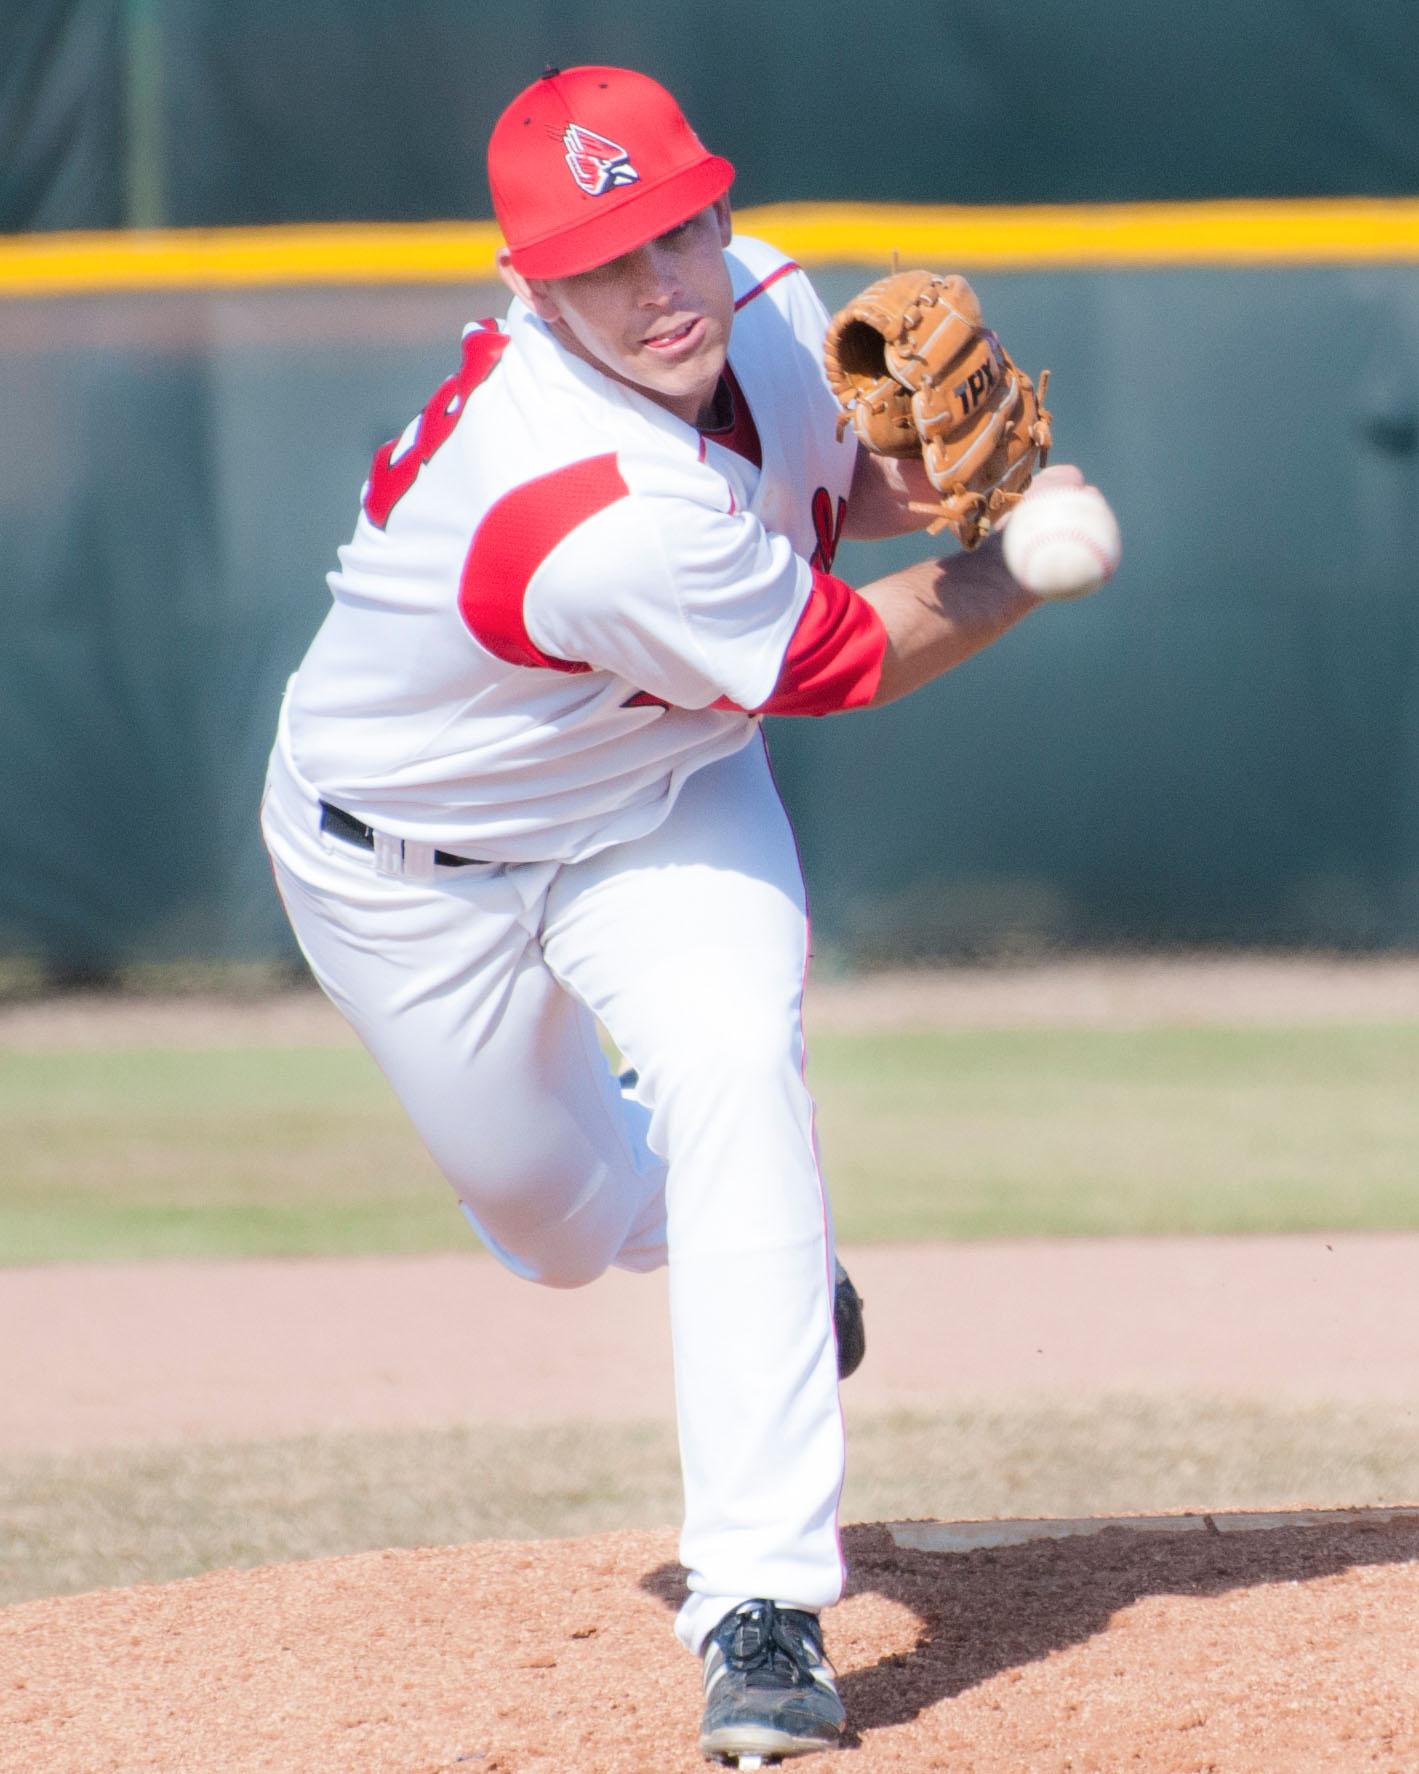 BASEBALL: Bullpen fuels pitching staff